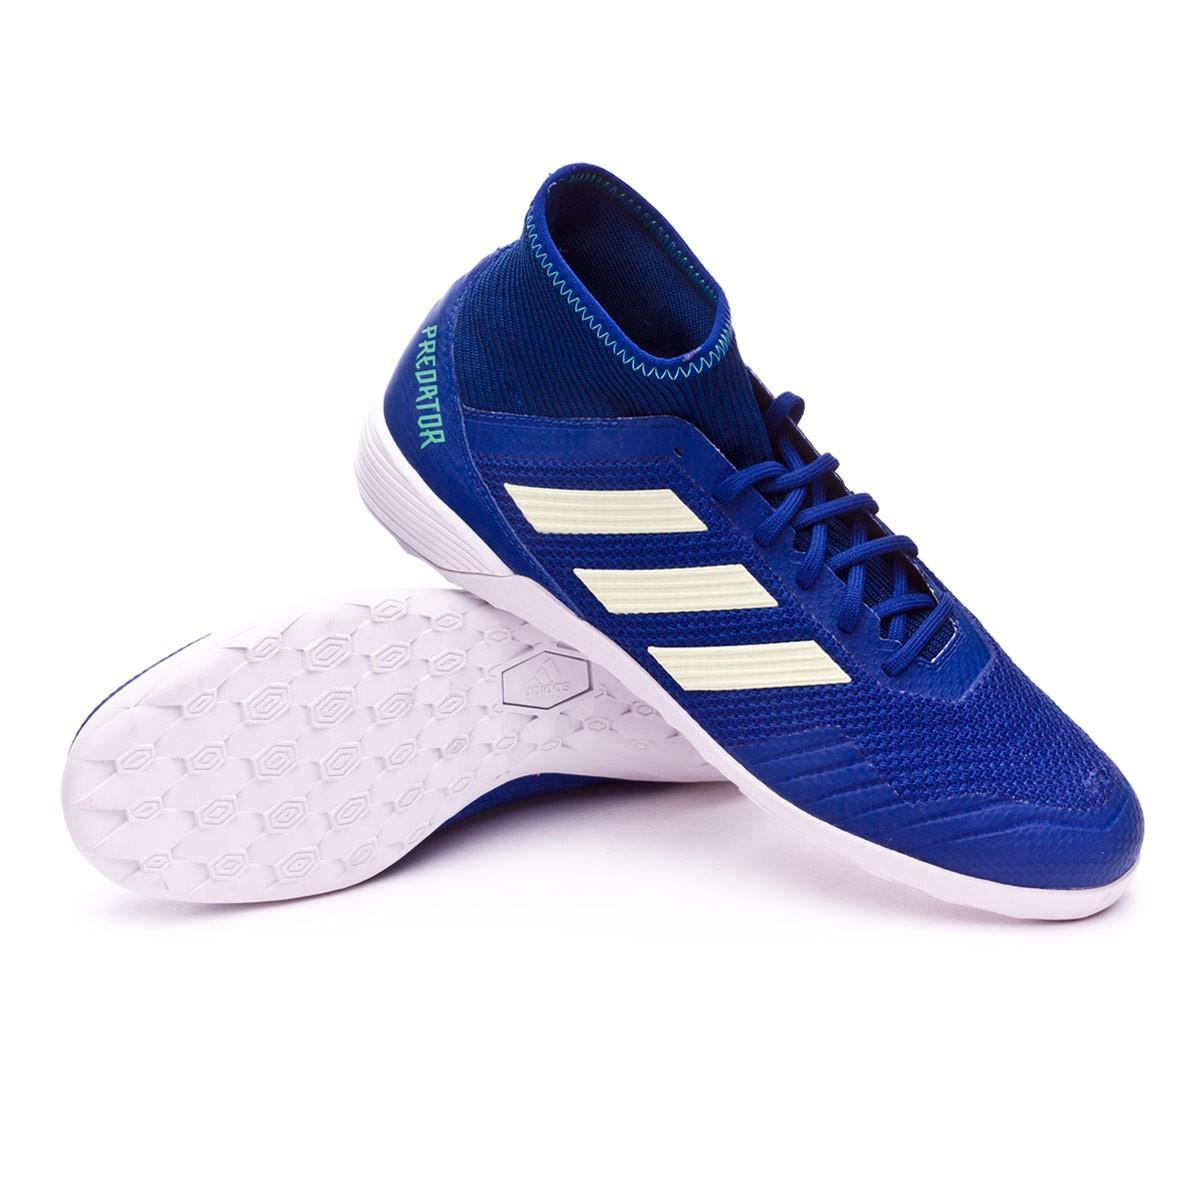 896a006d4 Futsal Boot adidas Predator Tango 18.3 IN Unity ink-Aero green-Hi-res green  - Football store Fútbol Emotion